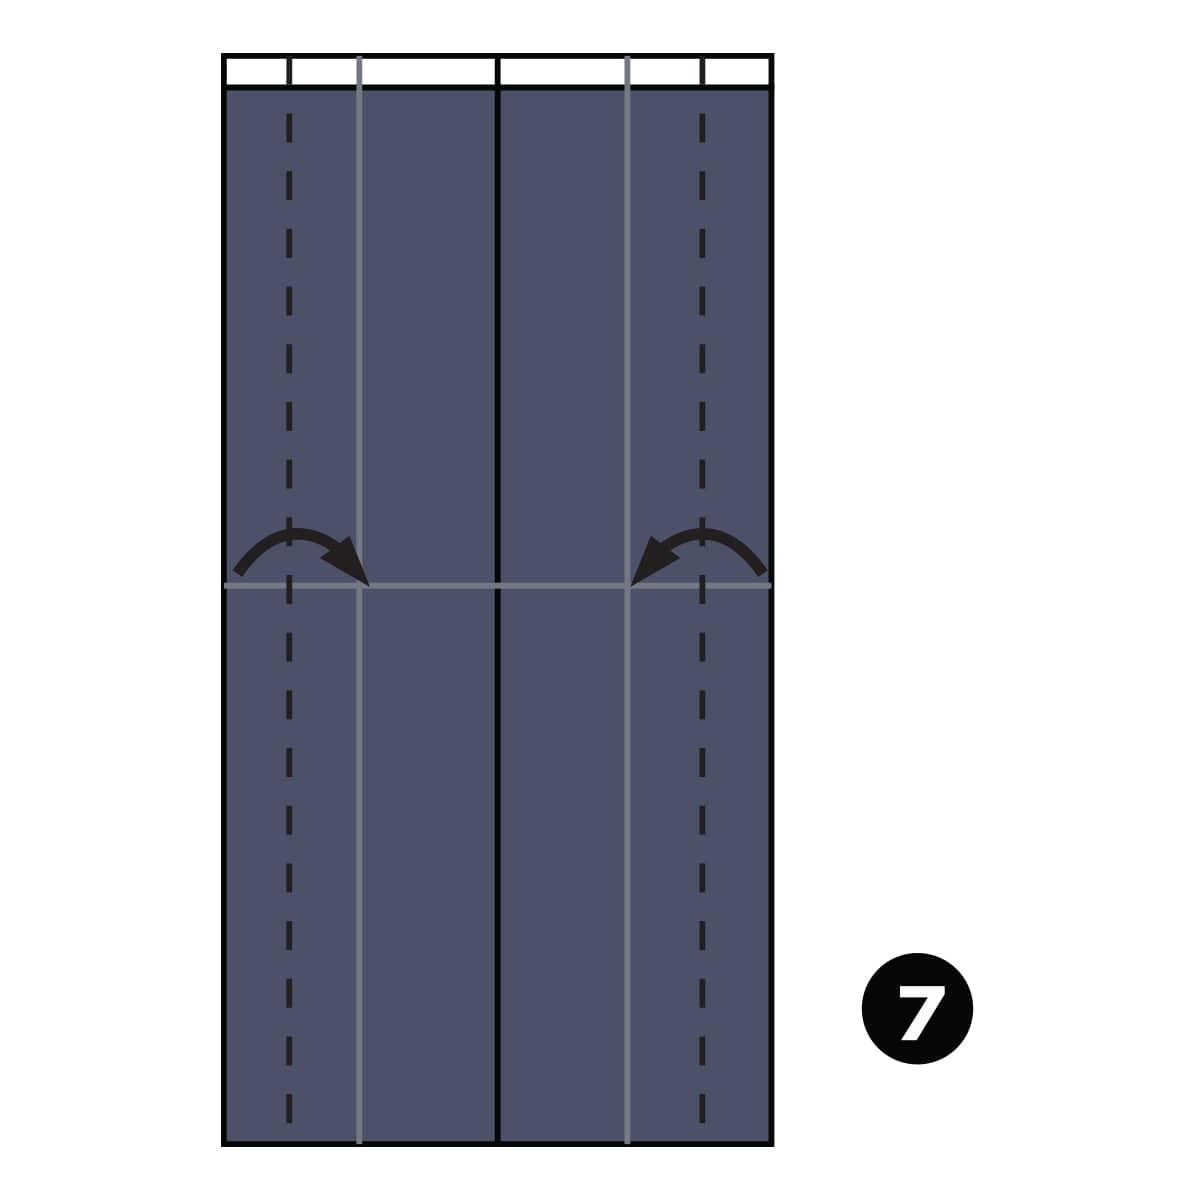 Tuxedo Step 7